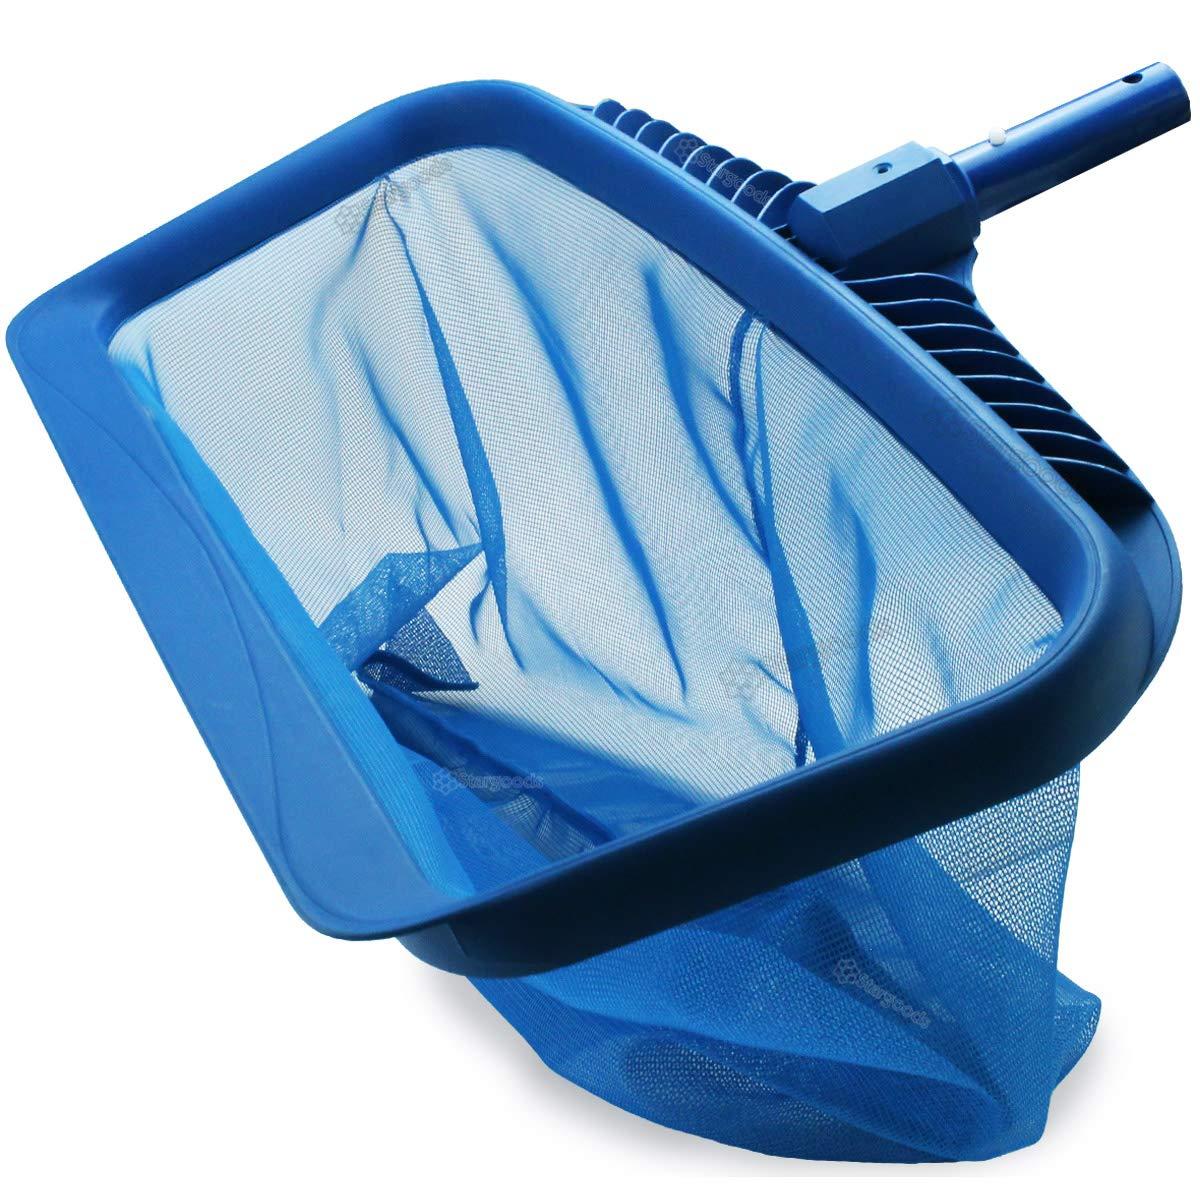 Stargoods Pool Skimmer - Heavy Duty Cleaner Tool & Net Bag Leaf Cleaning